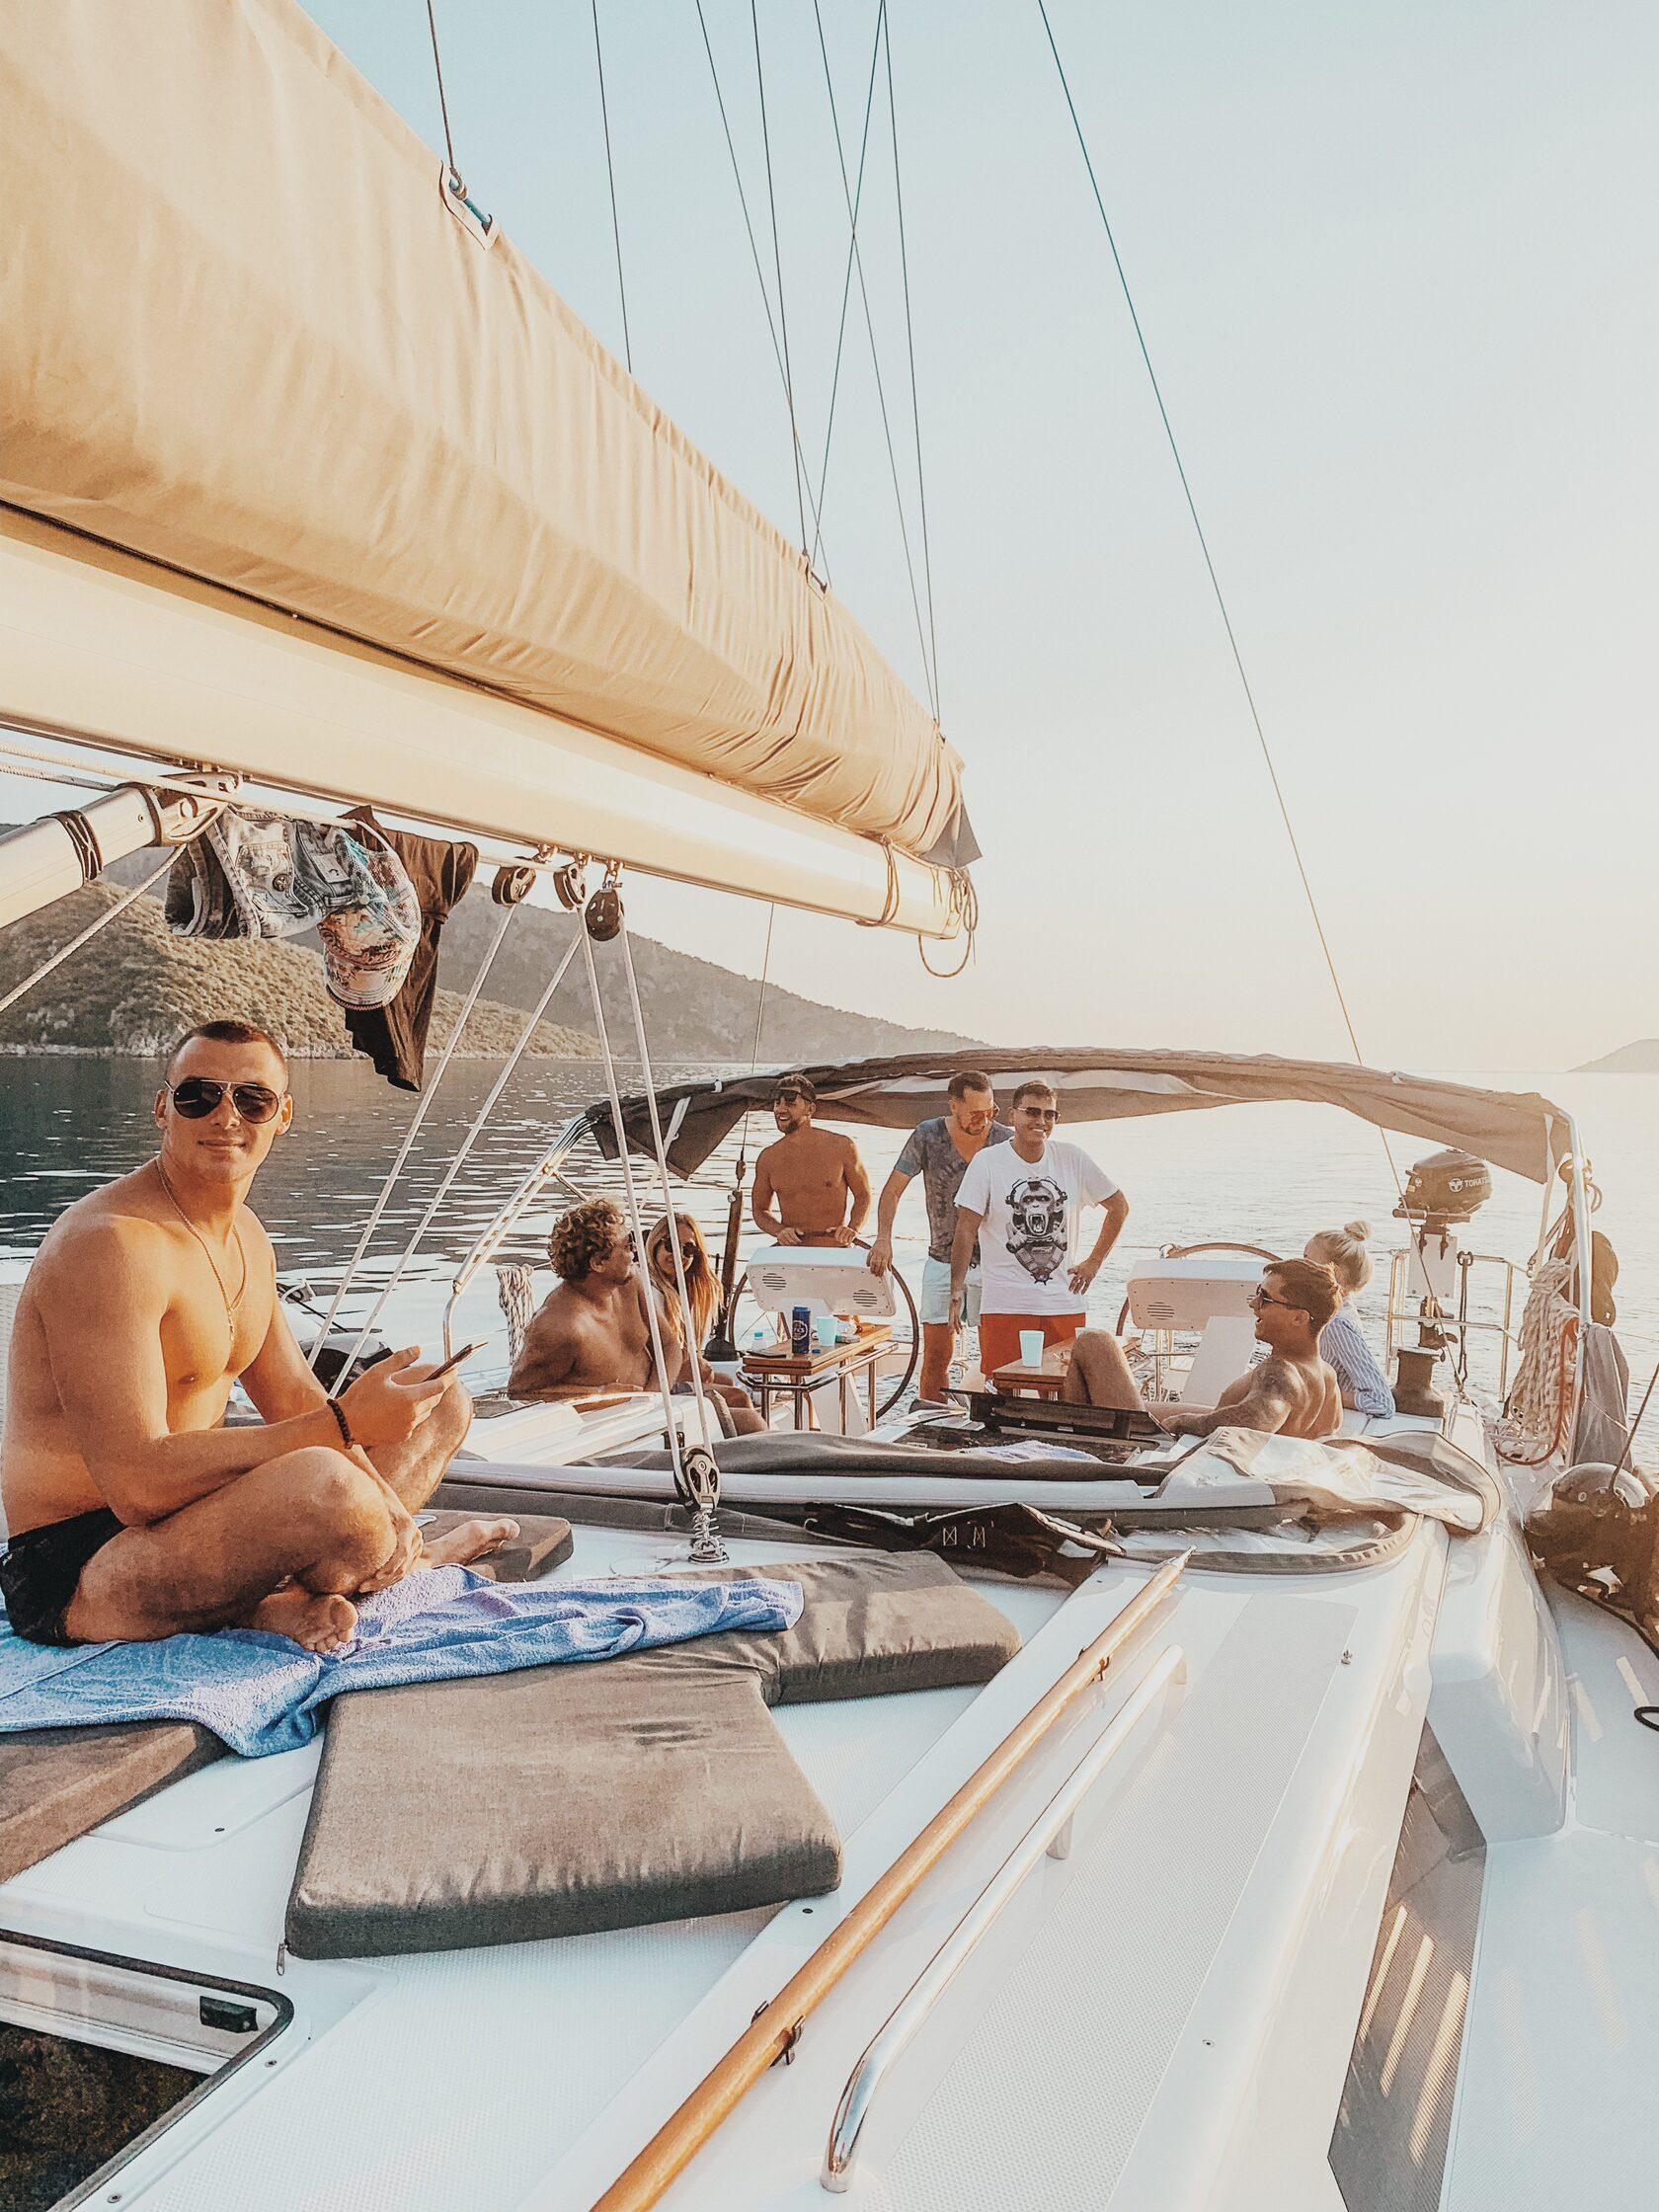 Сколько места на парусной яхте